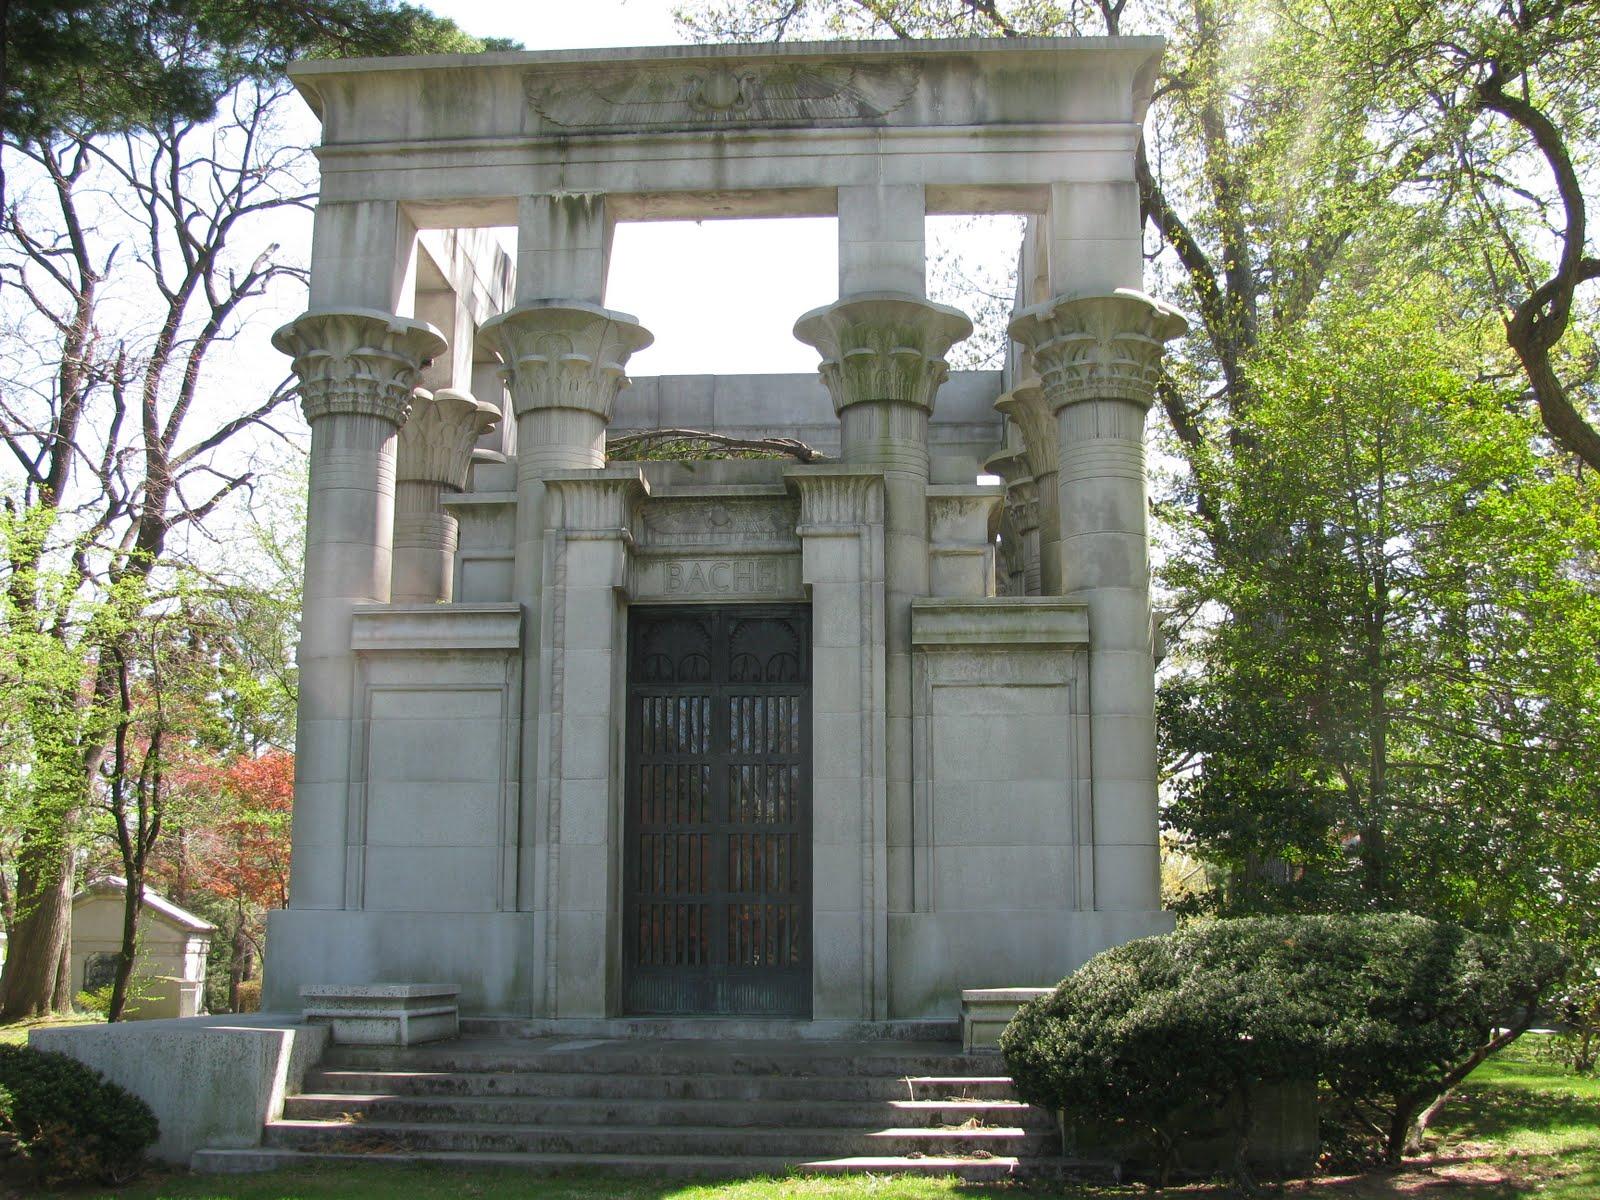 Mary Tomaselli S Photos Woodlawn Cemetery Statuary